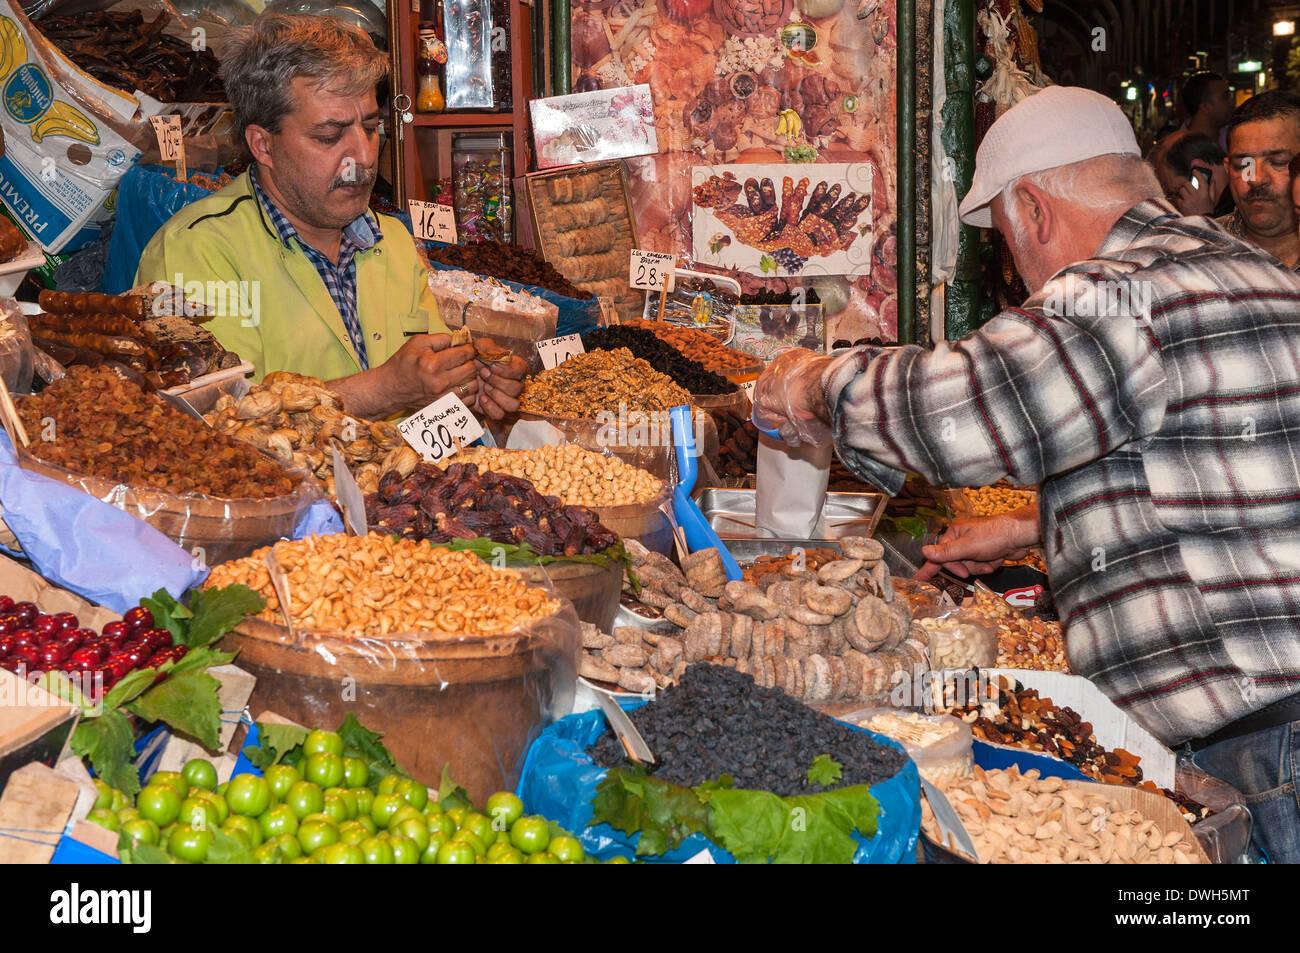 Egyptian Bazaar, Istanbul - Stock Image